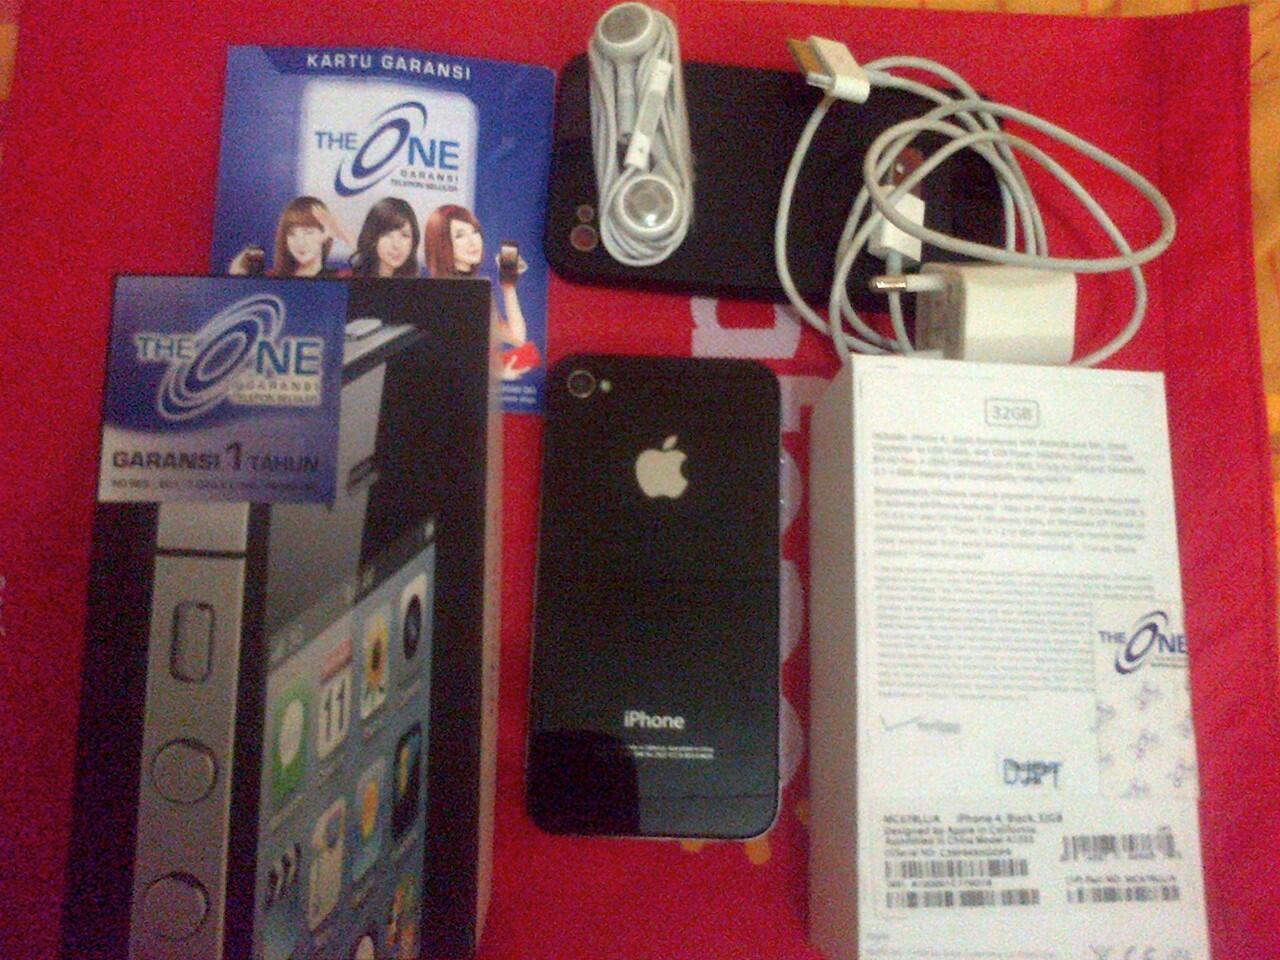 IPHONE 4 BLACK CDMA 32 GB, ORI, BNOB, 99,99% , GRS THE ONE